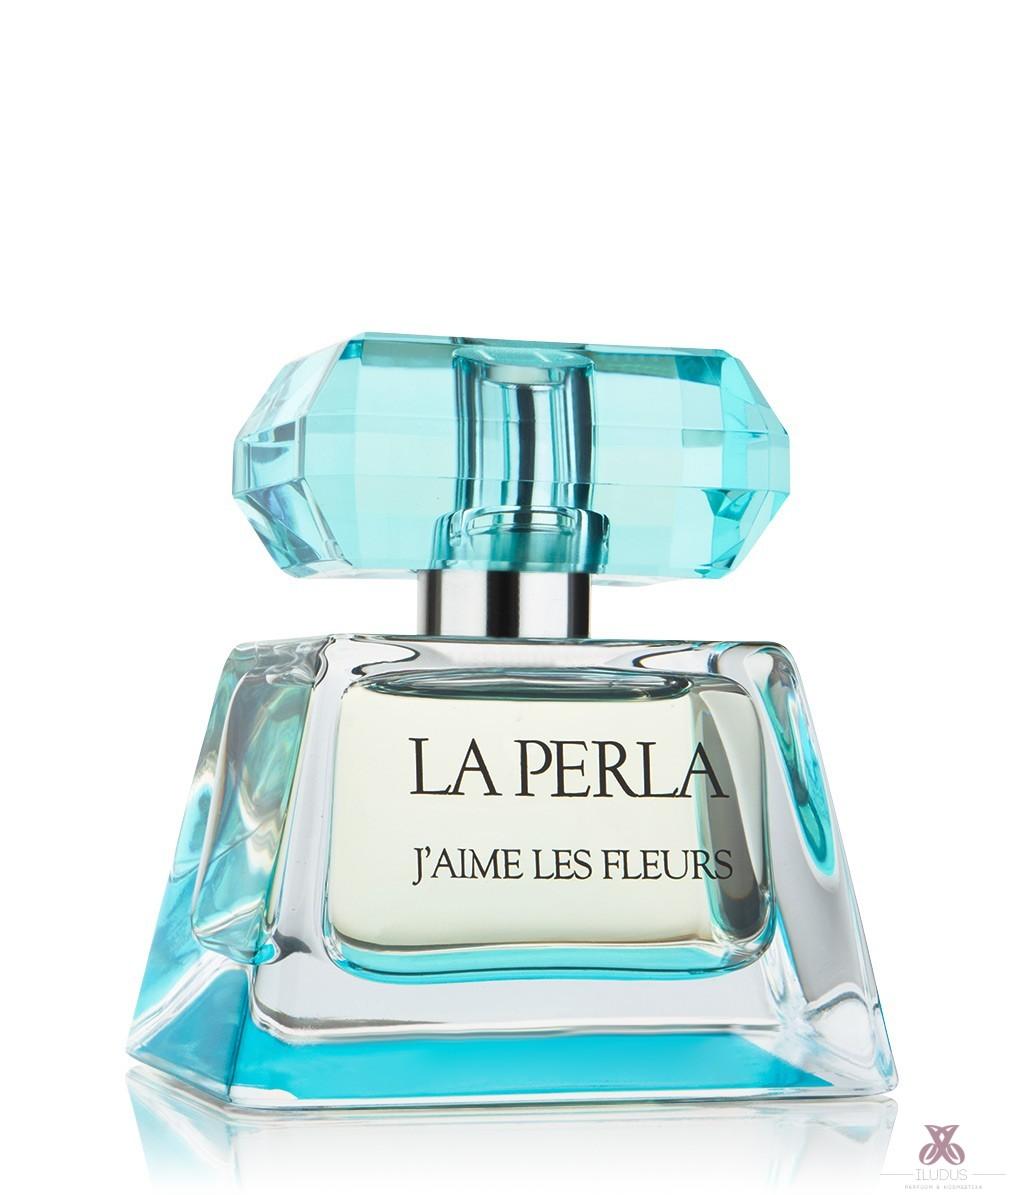 Daydream Believer:  La Perla J'aime les Fleurs by La Perla